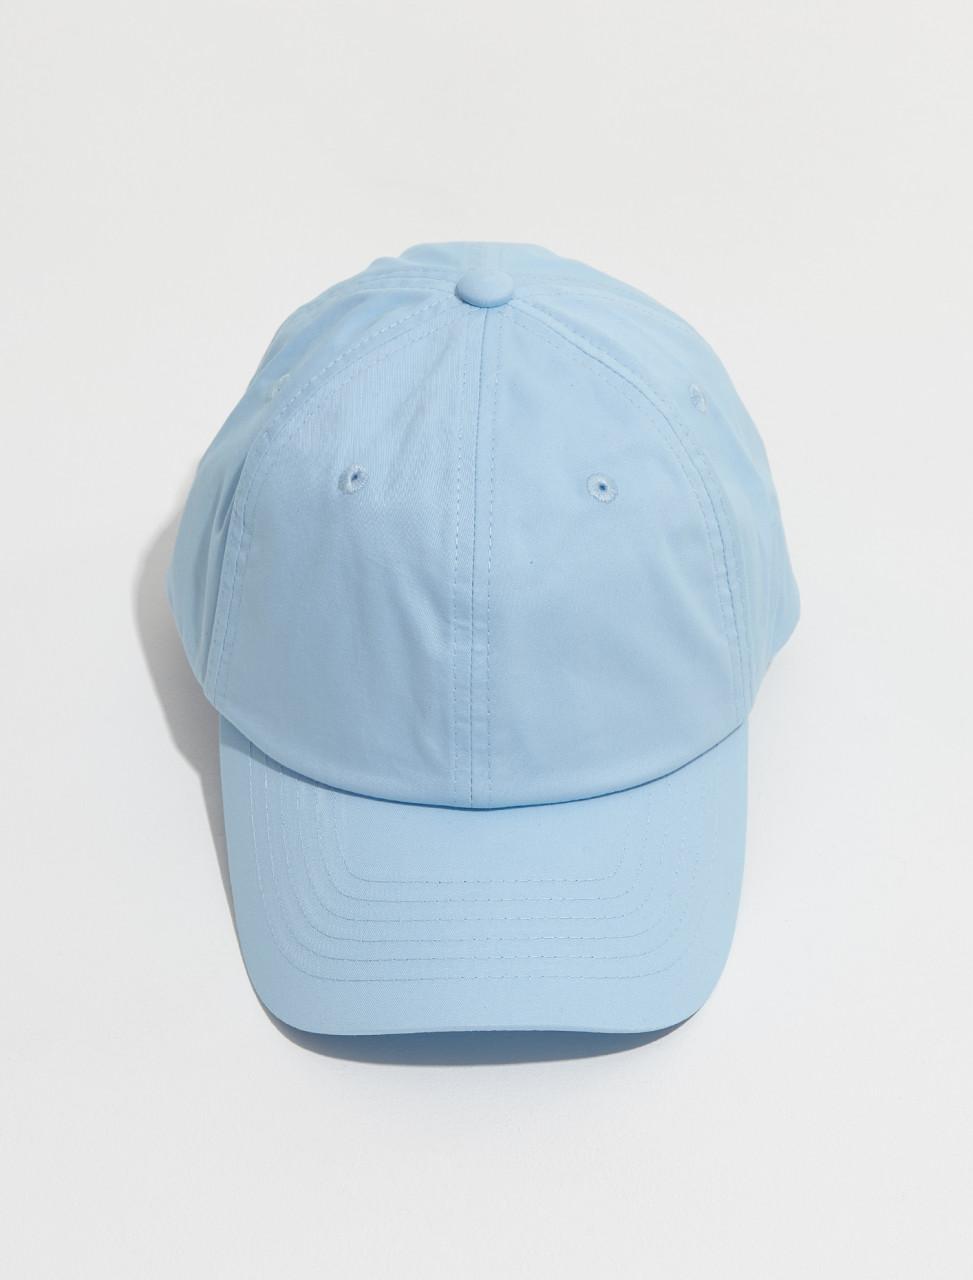 C40169 228 FA UX HATS000105 ACNE STUDIOS CUNOV LIGHT TWILL FACE CAP IN LIGHT BLUE